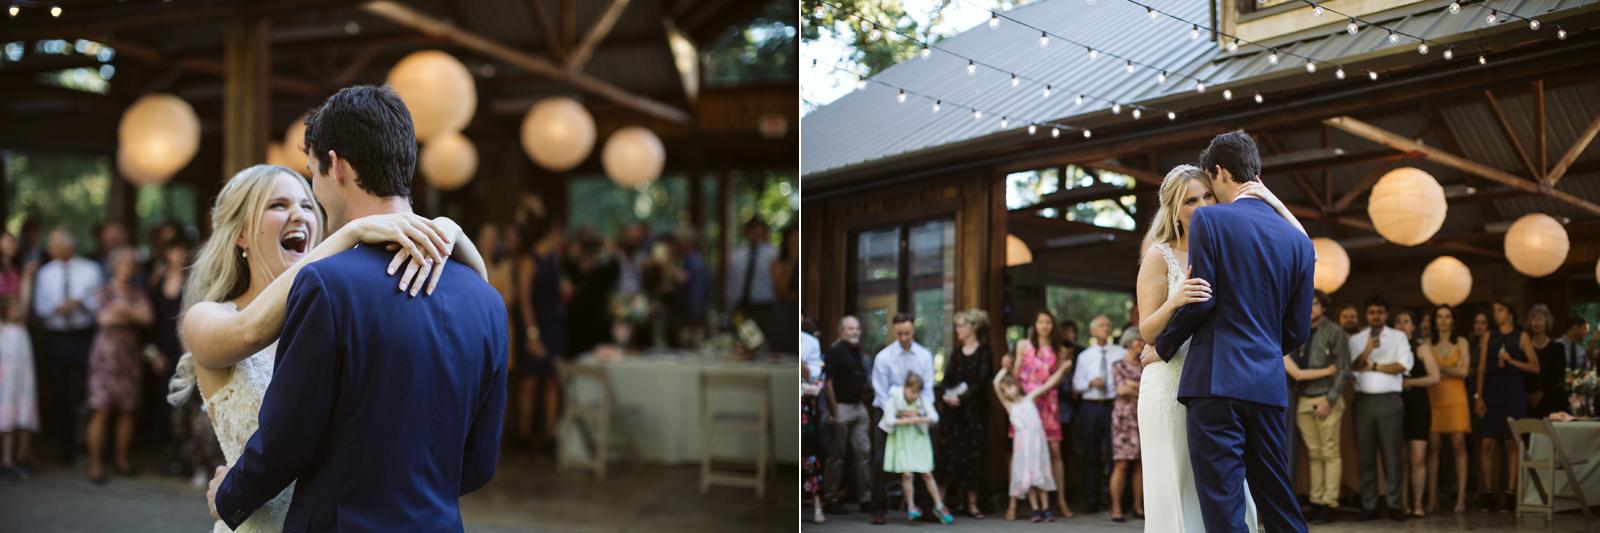 108-daronjackson-rachel-michael-wedding-mtpisgah.jpg